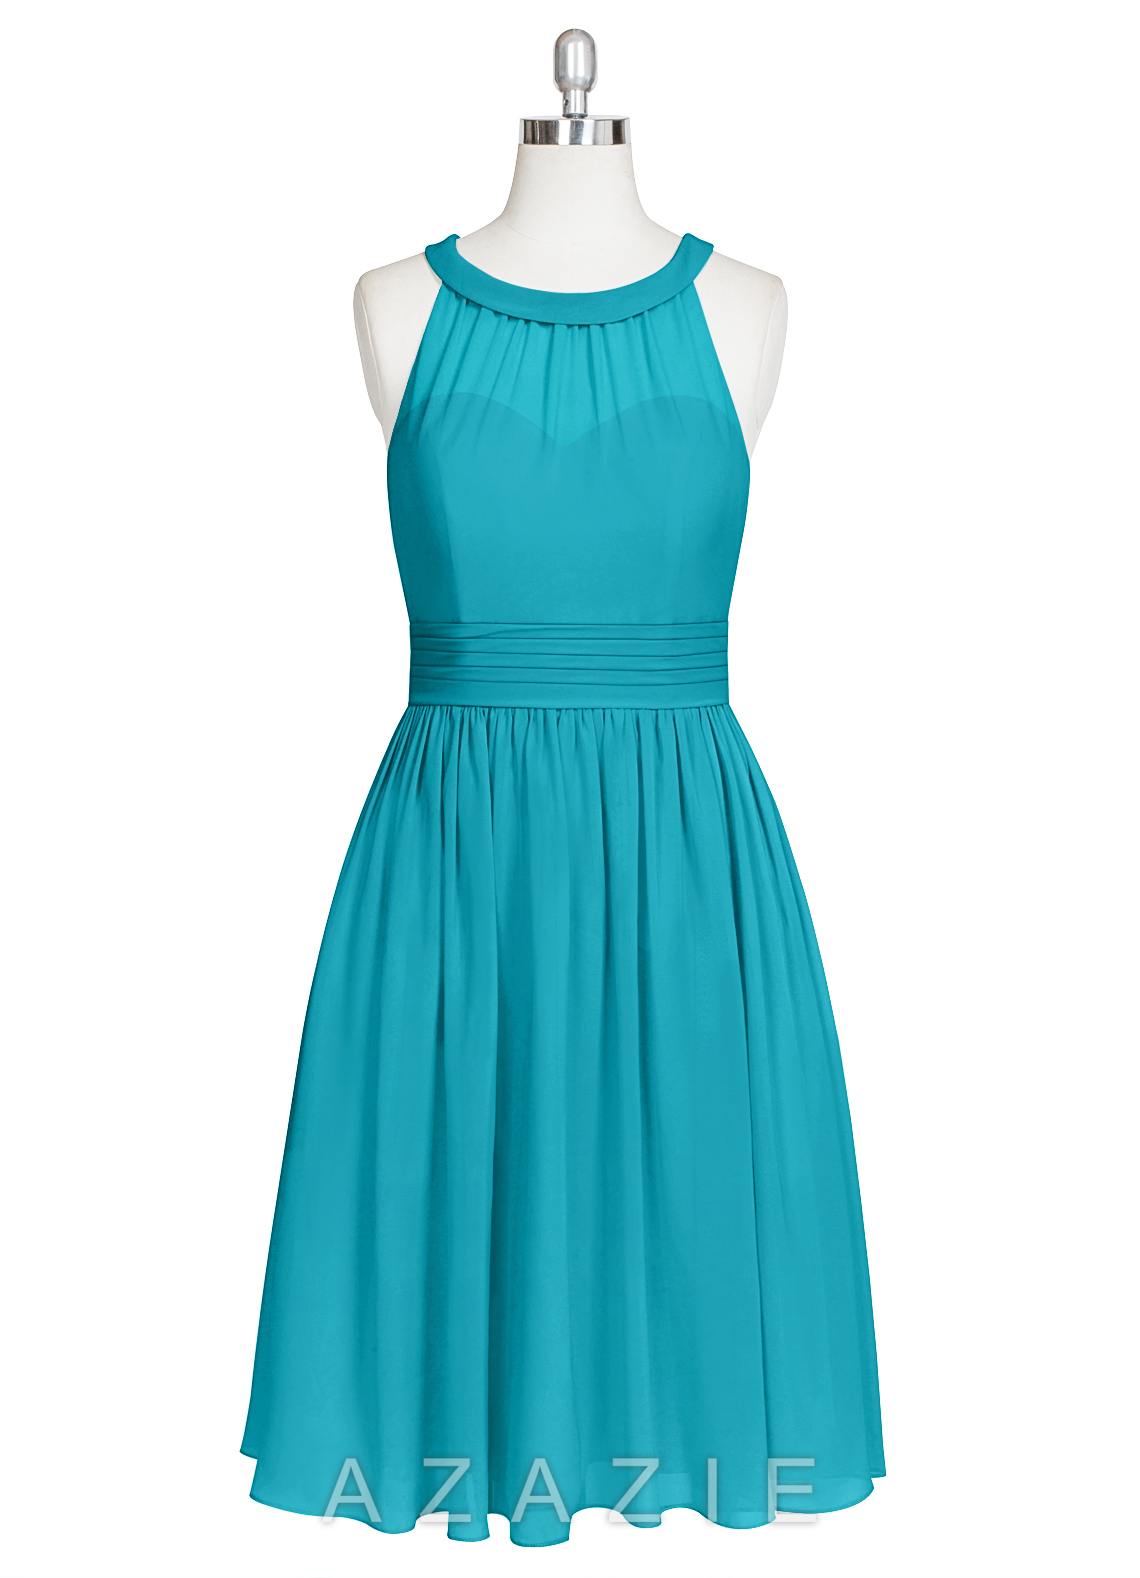 Azazie Taylor Bridesmaid Dress | Azazie